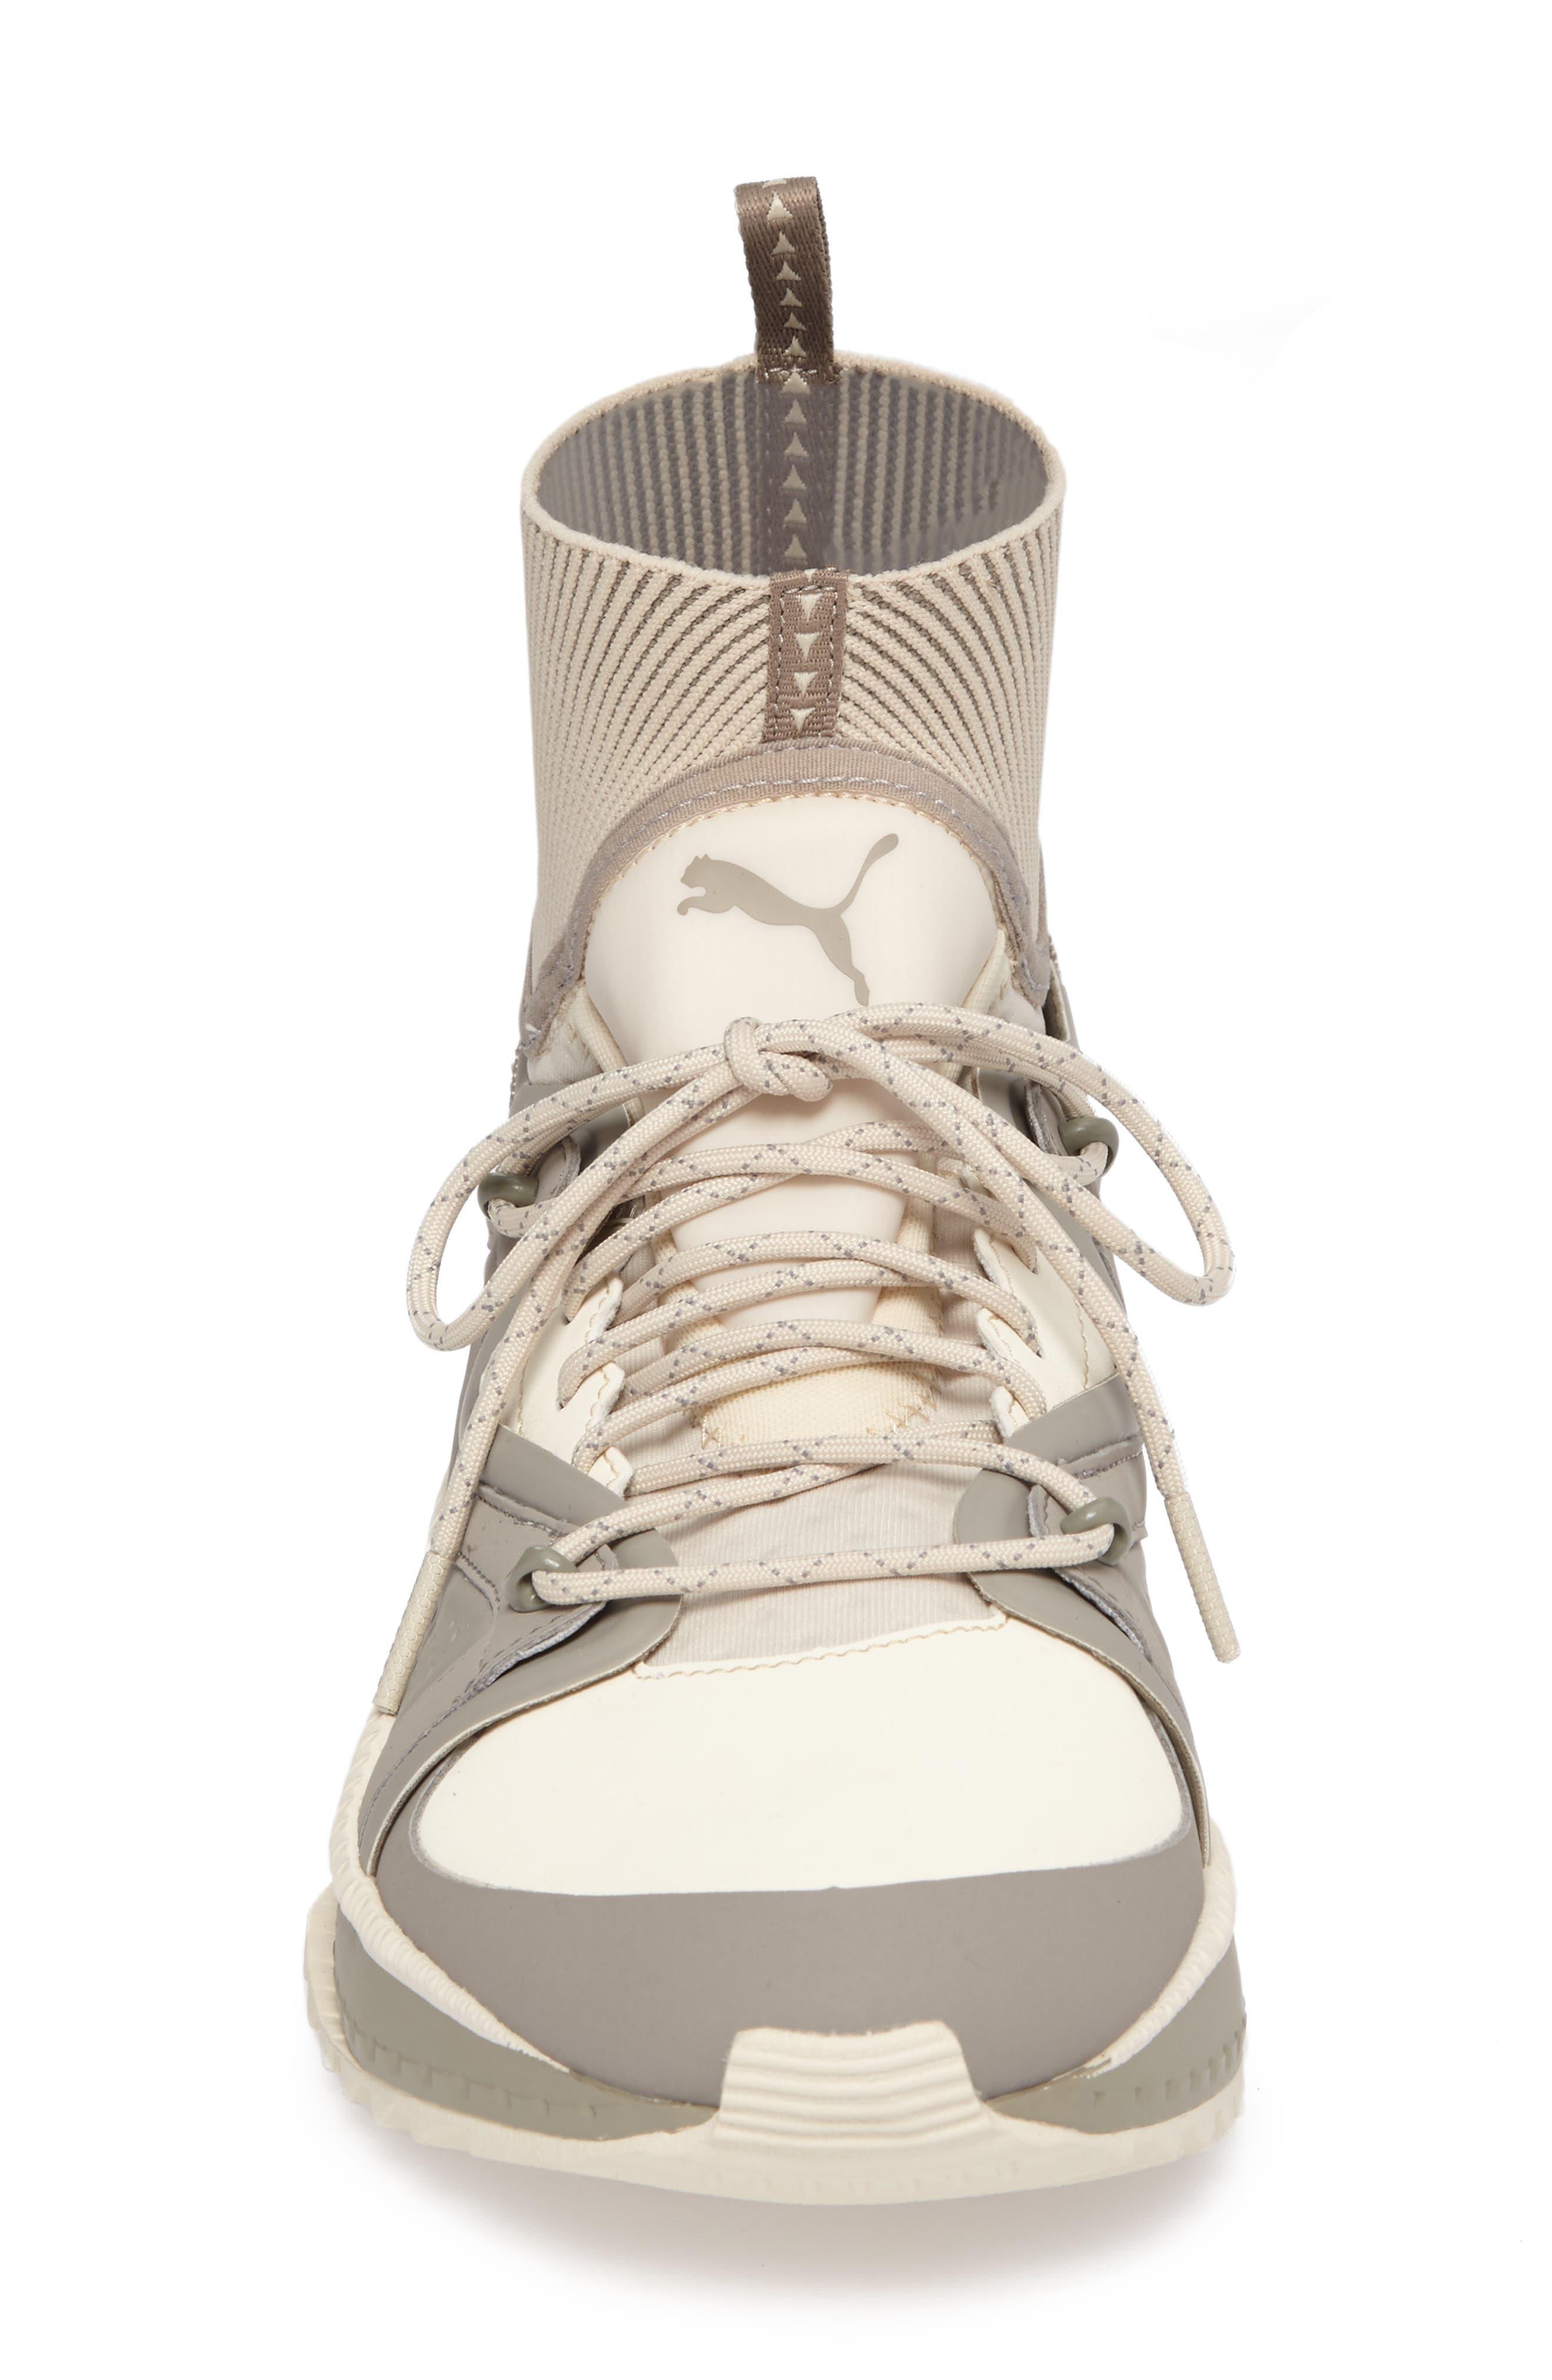 Tsugi Kori Sneaker,                             Alternate thumbnail 4, color,                             Rock Ridge/ Birch